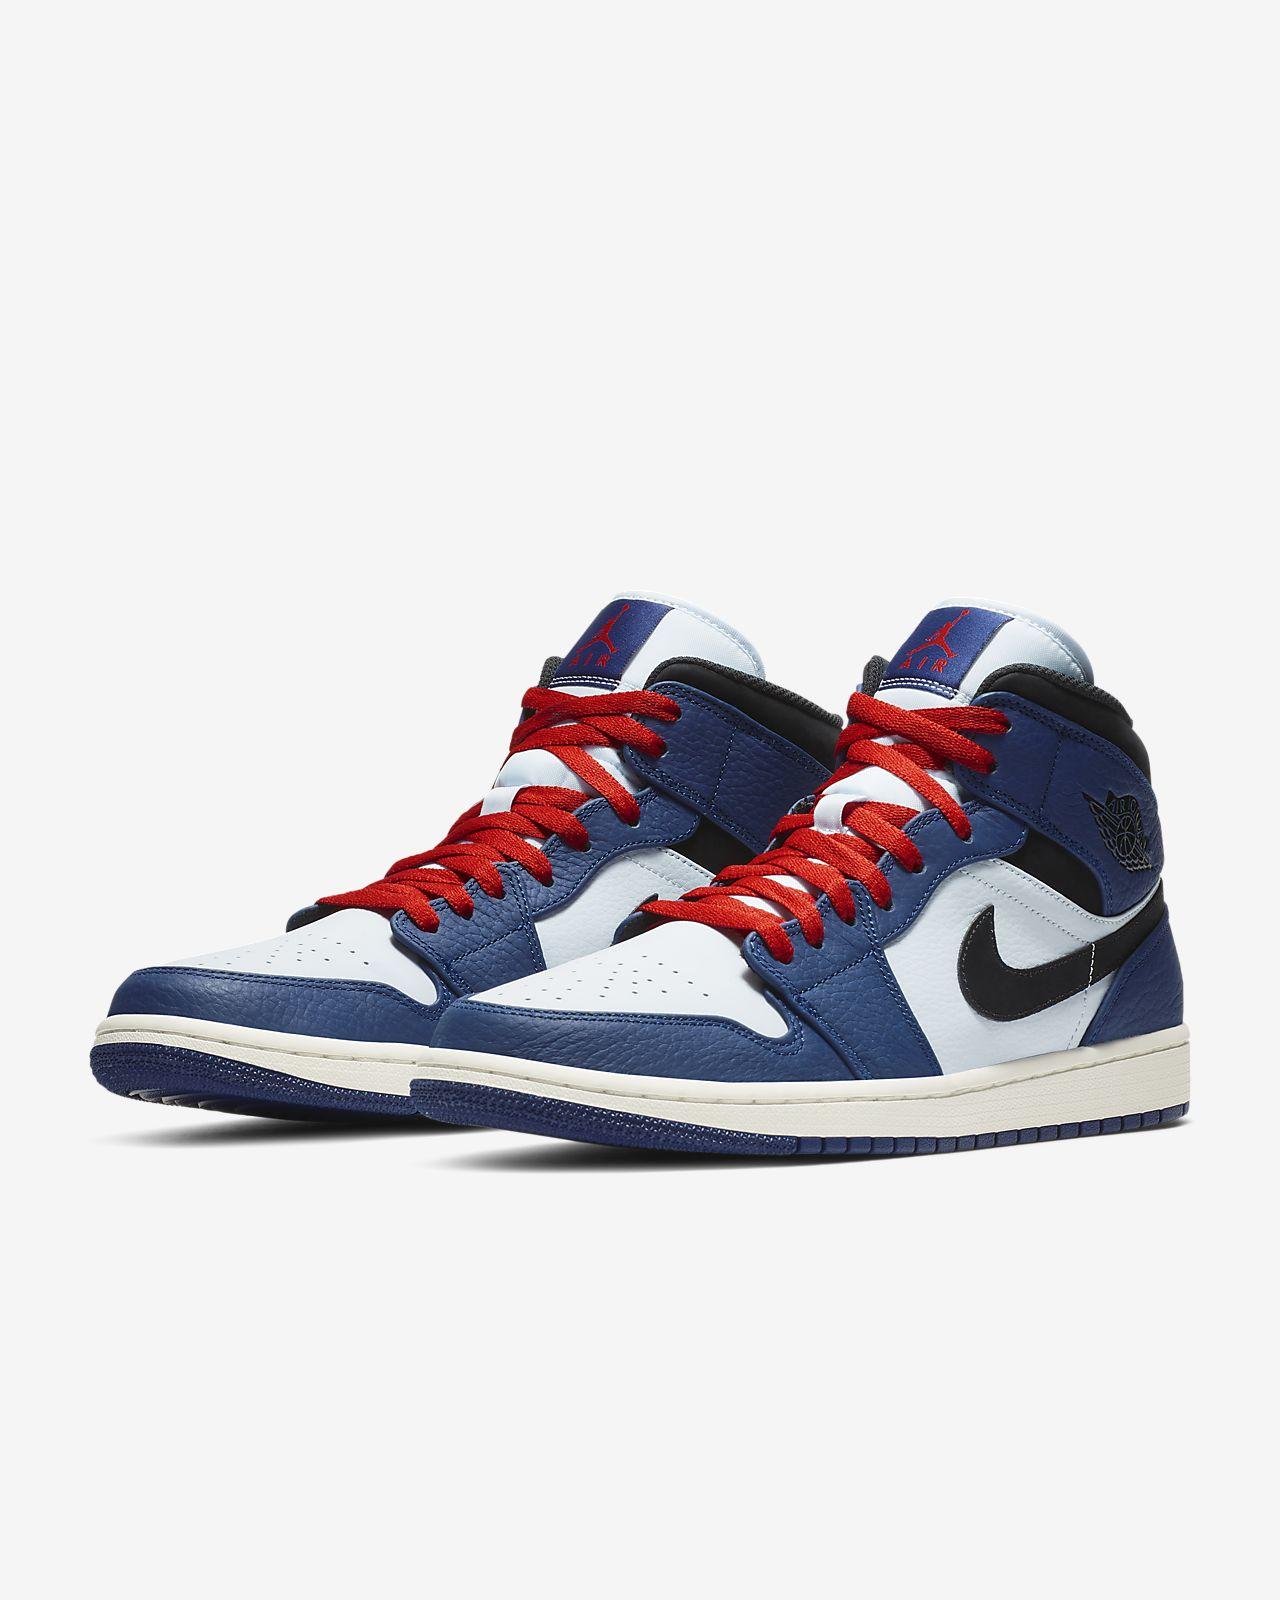 bf1d6fa6b2e127 Air Jordan 1 Mid SE Men s Shoe. Nike.com ID